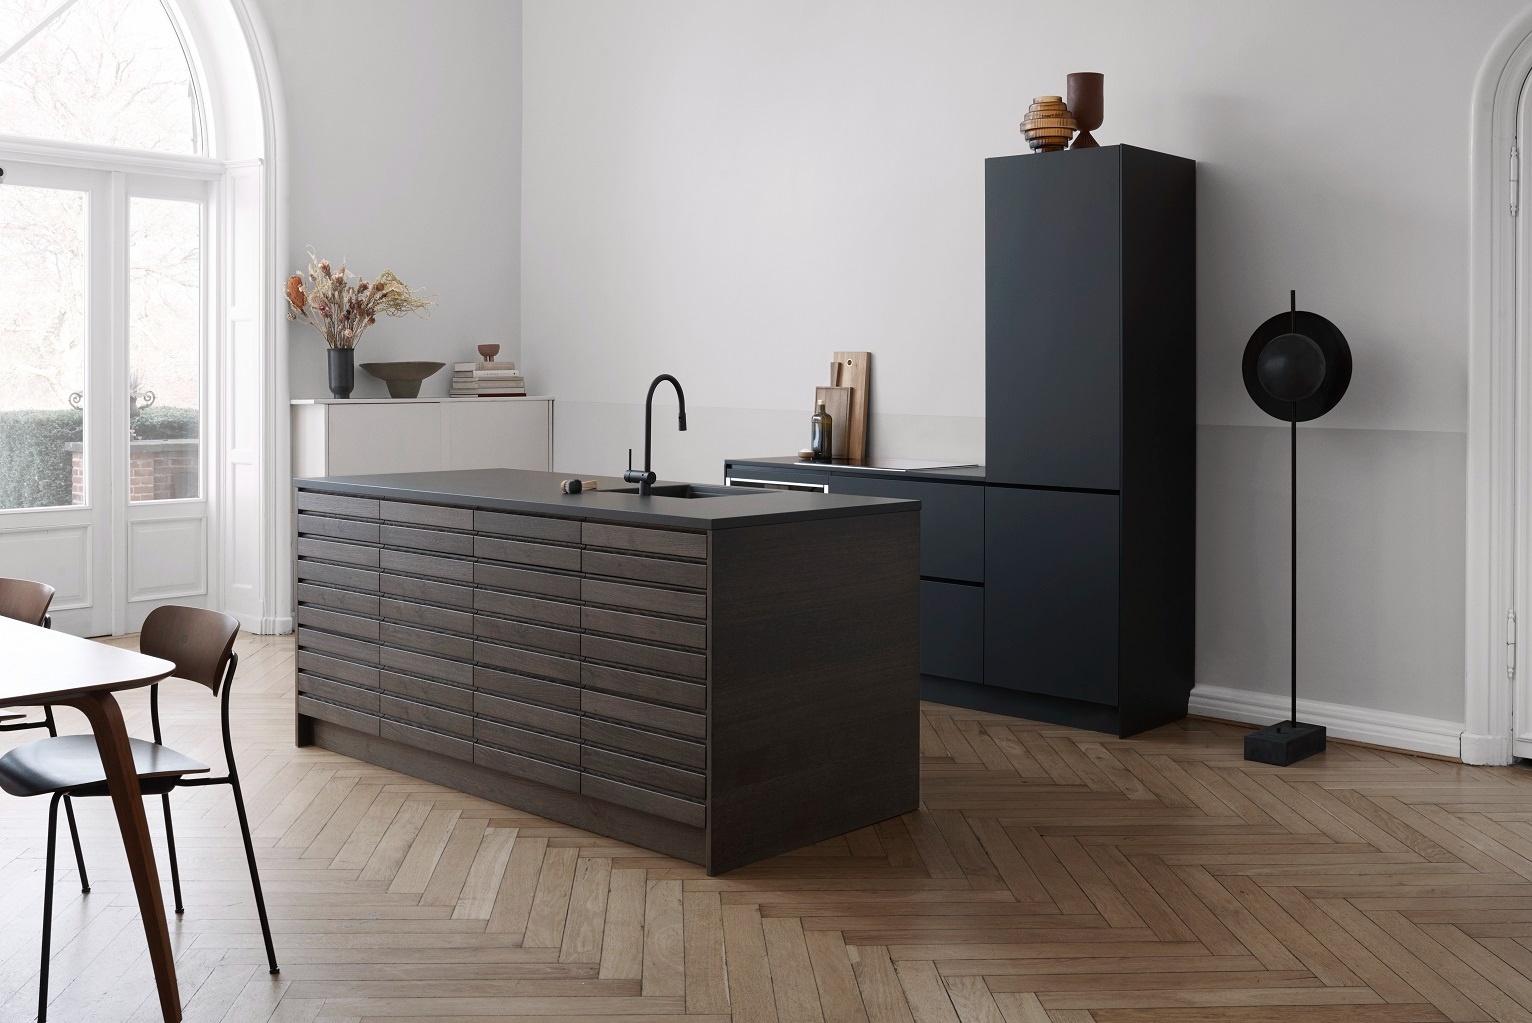 Cima Kitchen renovation in Danish Design.jpg